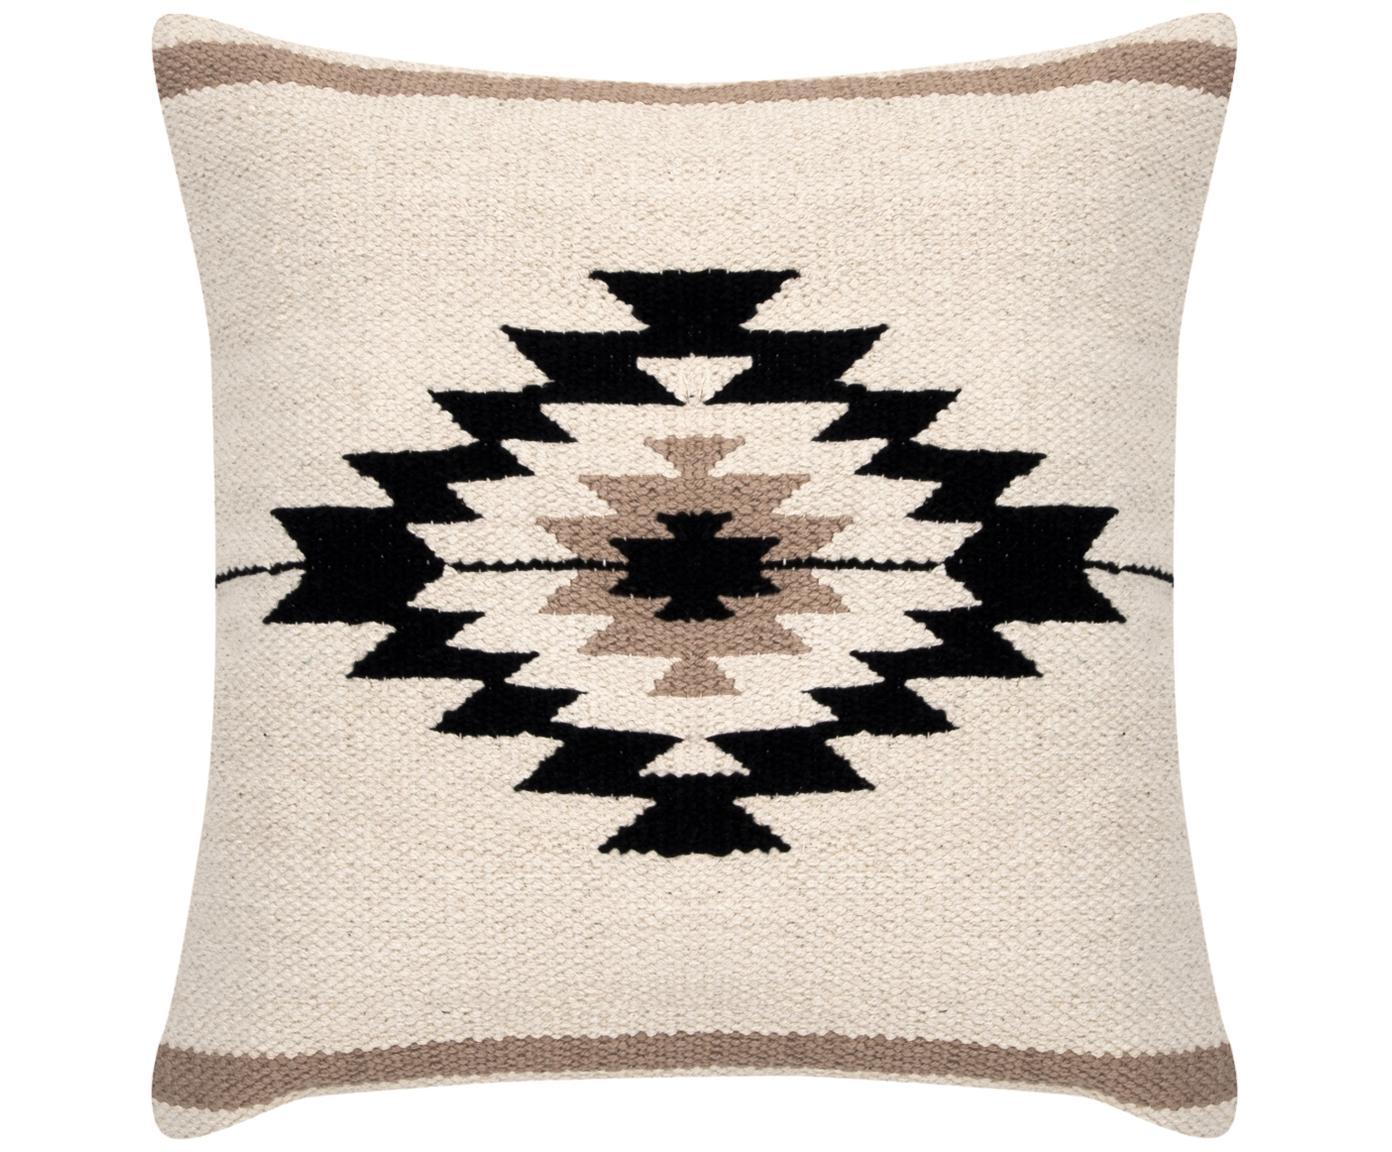 Funda de cojín Toluca, estilo étnico, Algodón, Negro, beige, gris pardo, An 45 x L 45 cm